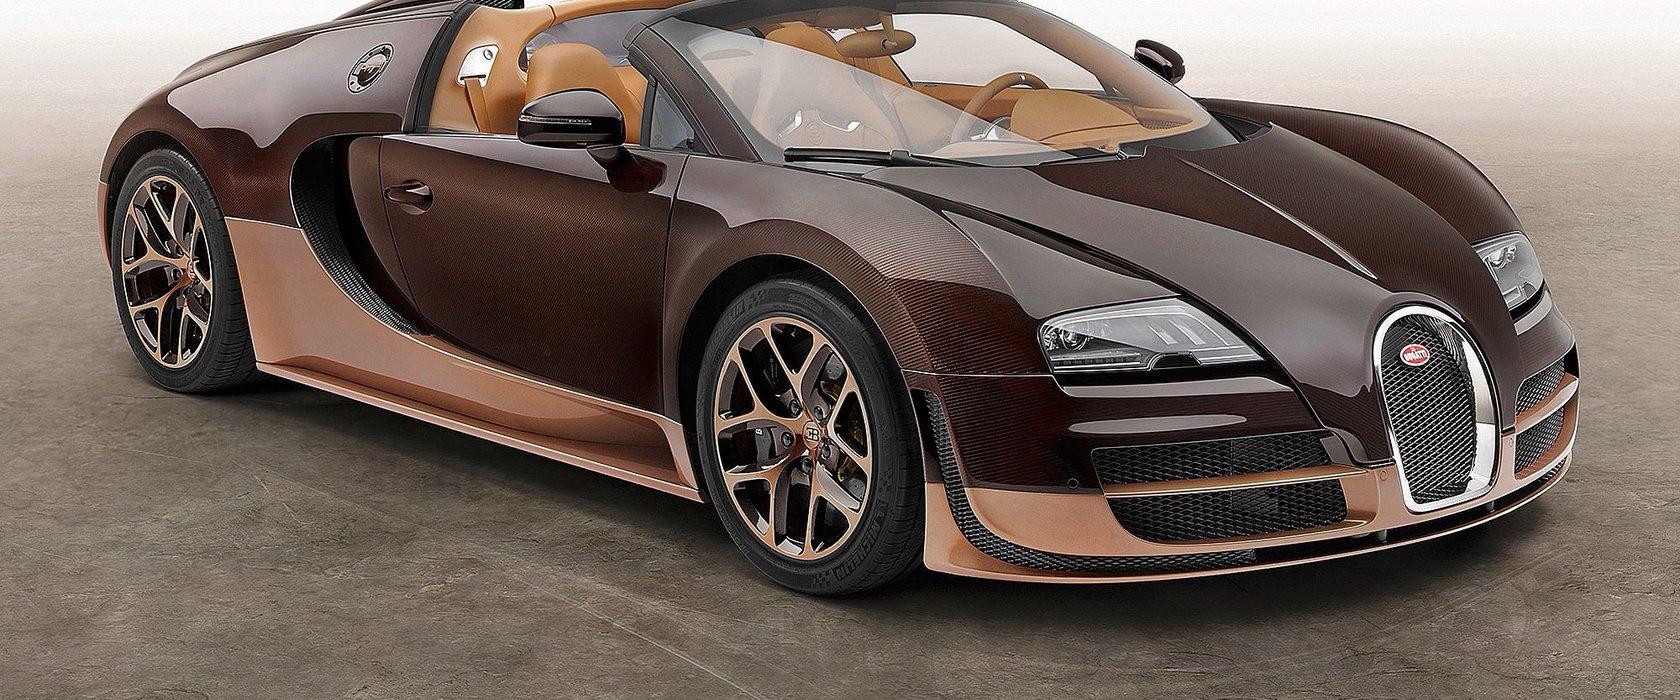 bugatti veyron 16 4 grand sport vitesse rembrandt bugatti red live. Black Bedroom Furniture Sets. Home Design Ideas